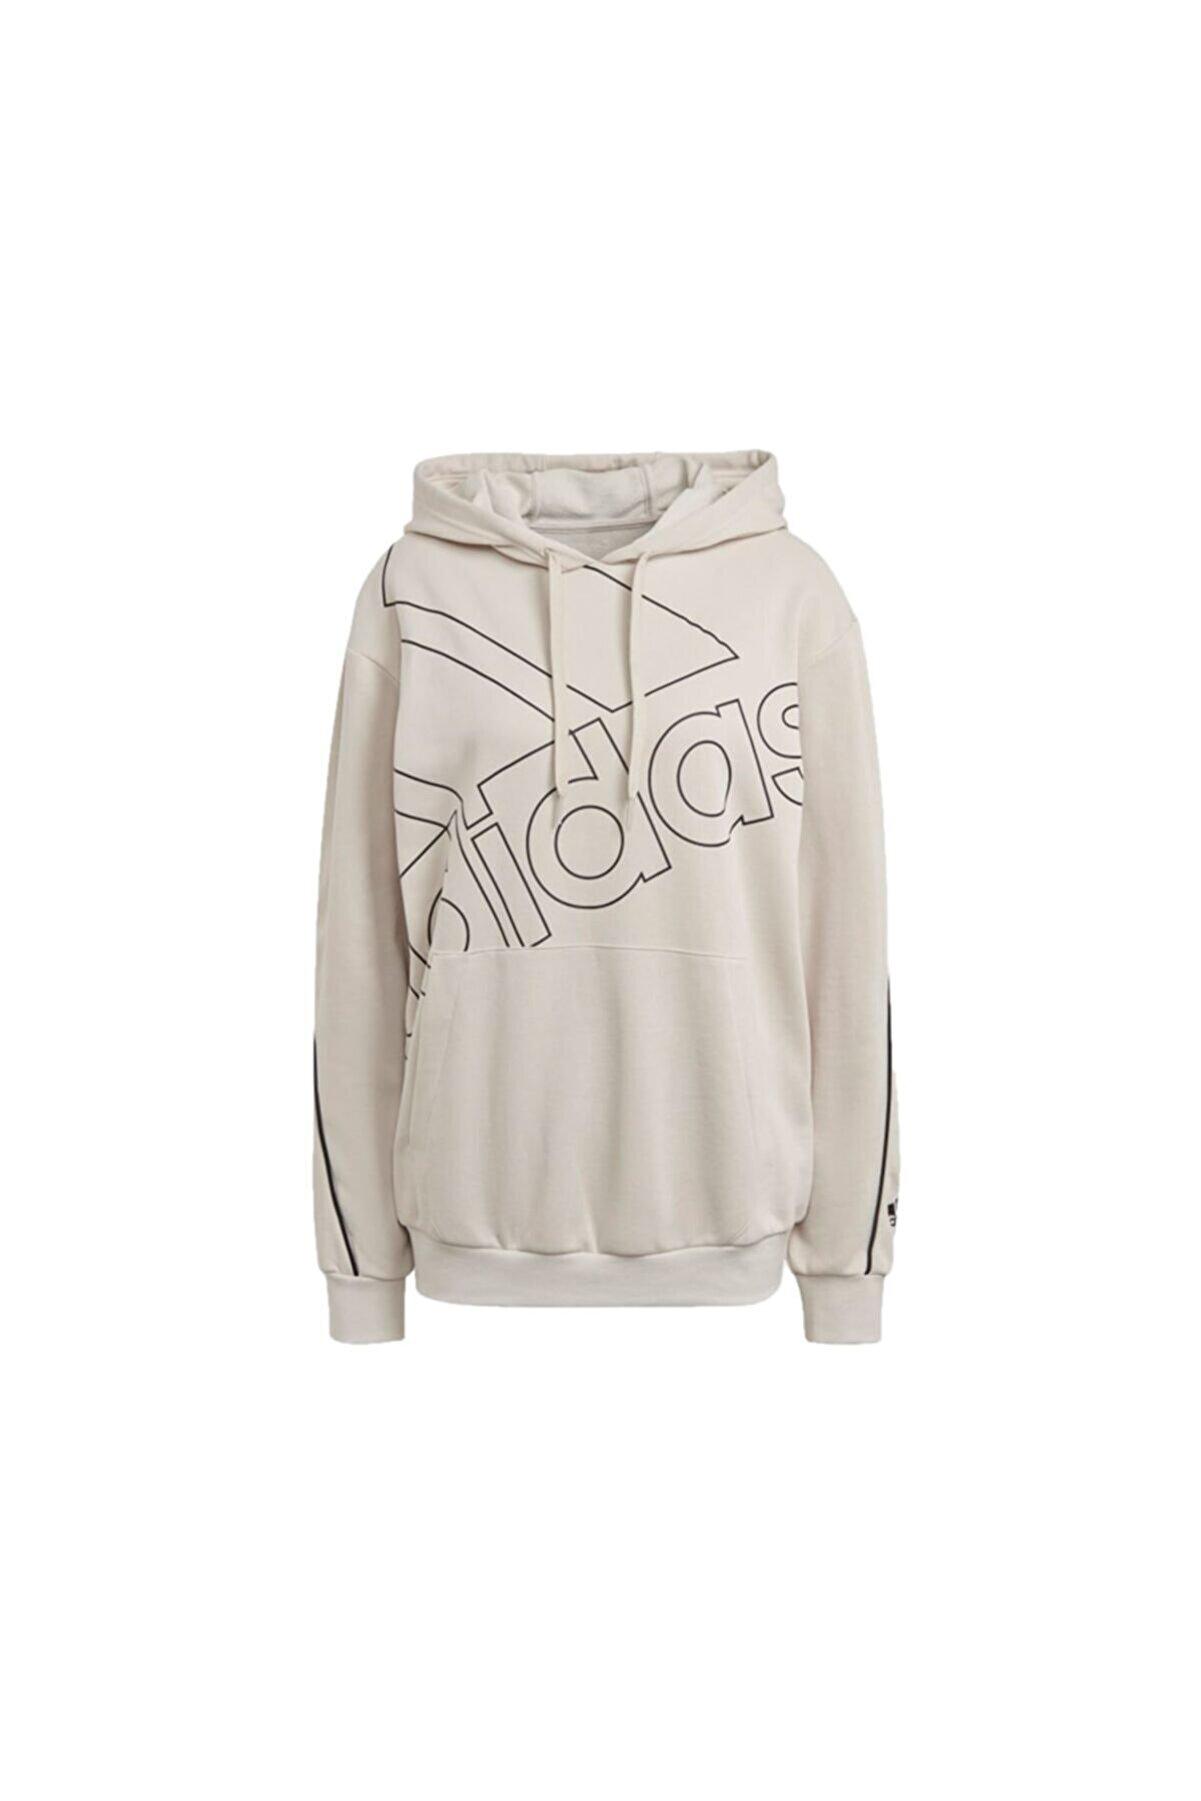 adidas Kadın Antrenman Sweatshirts Gm5517 Krem W Fav Q1 Hd